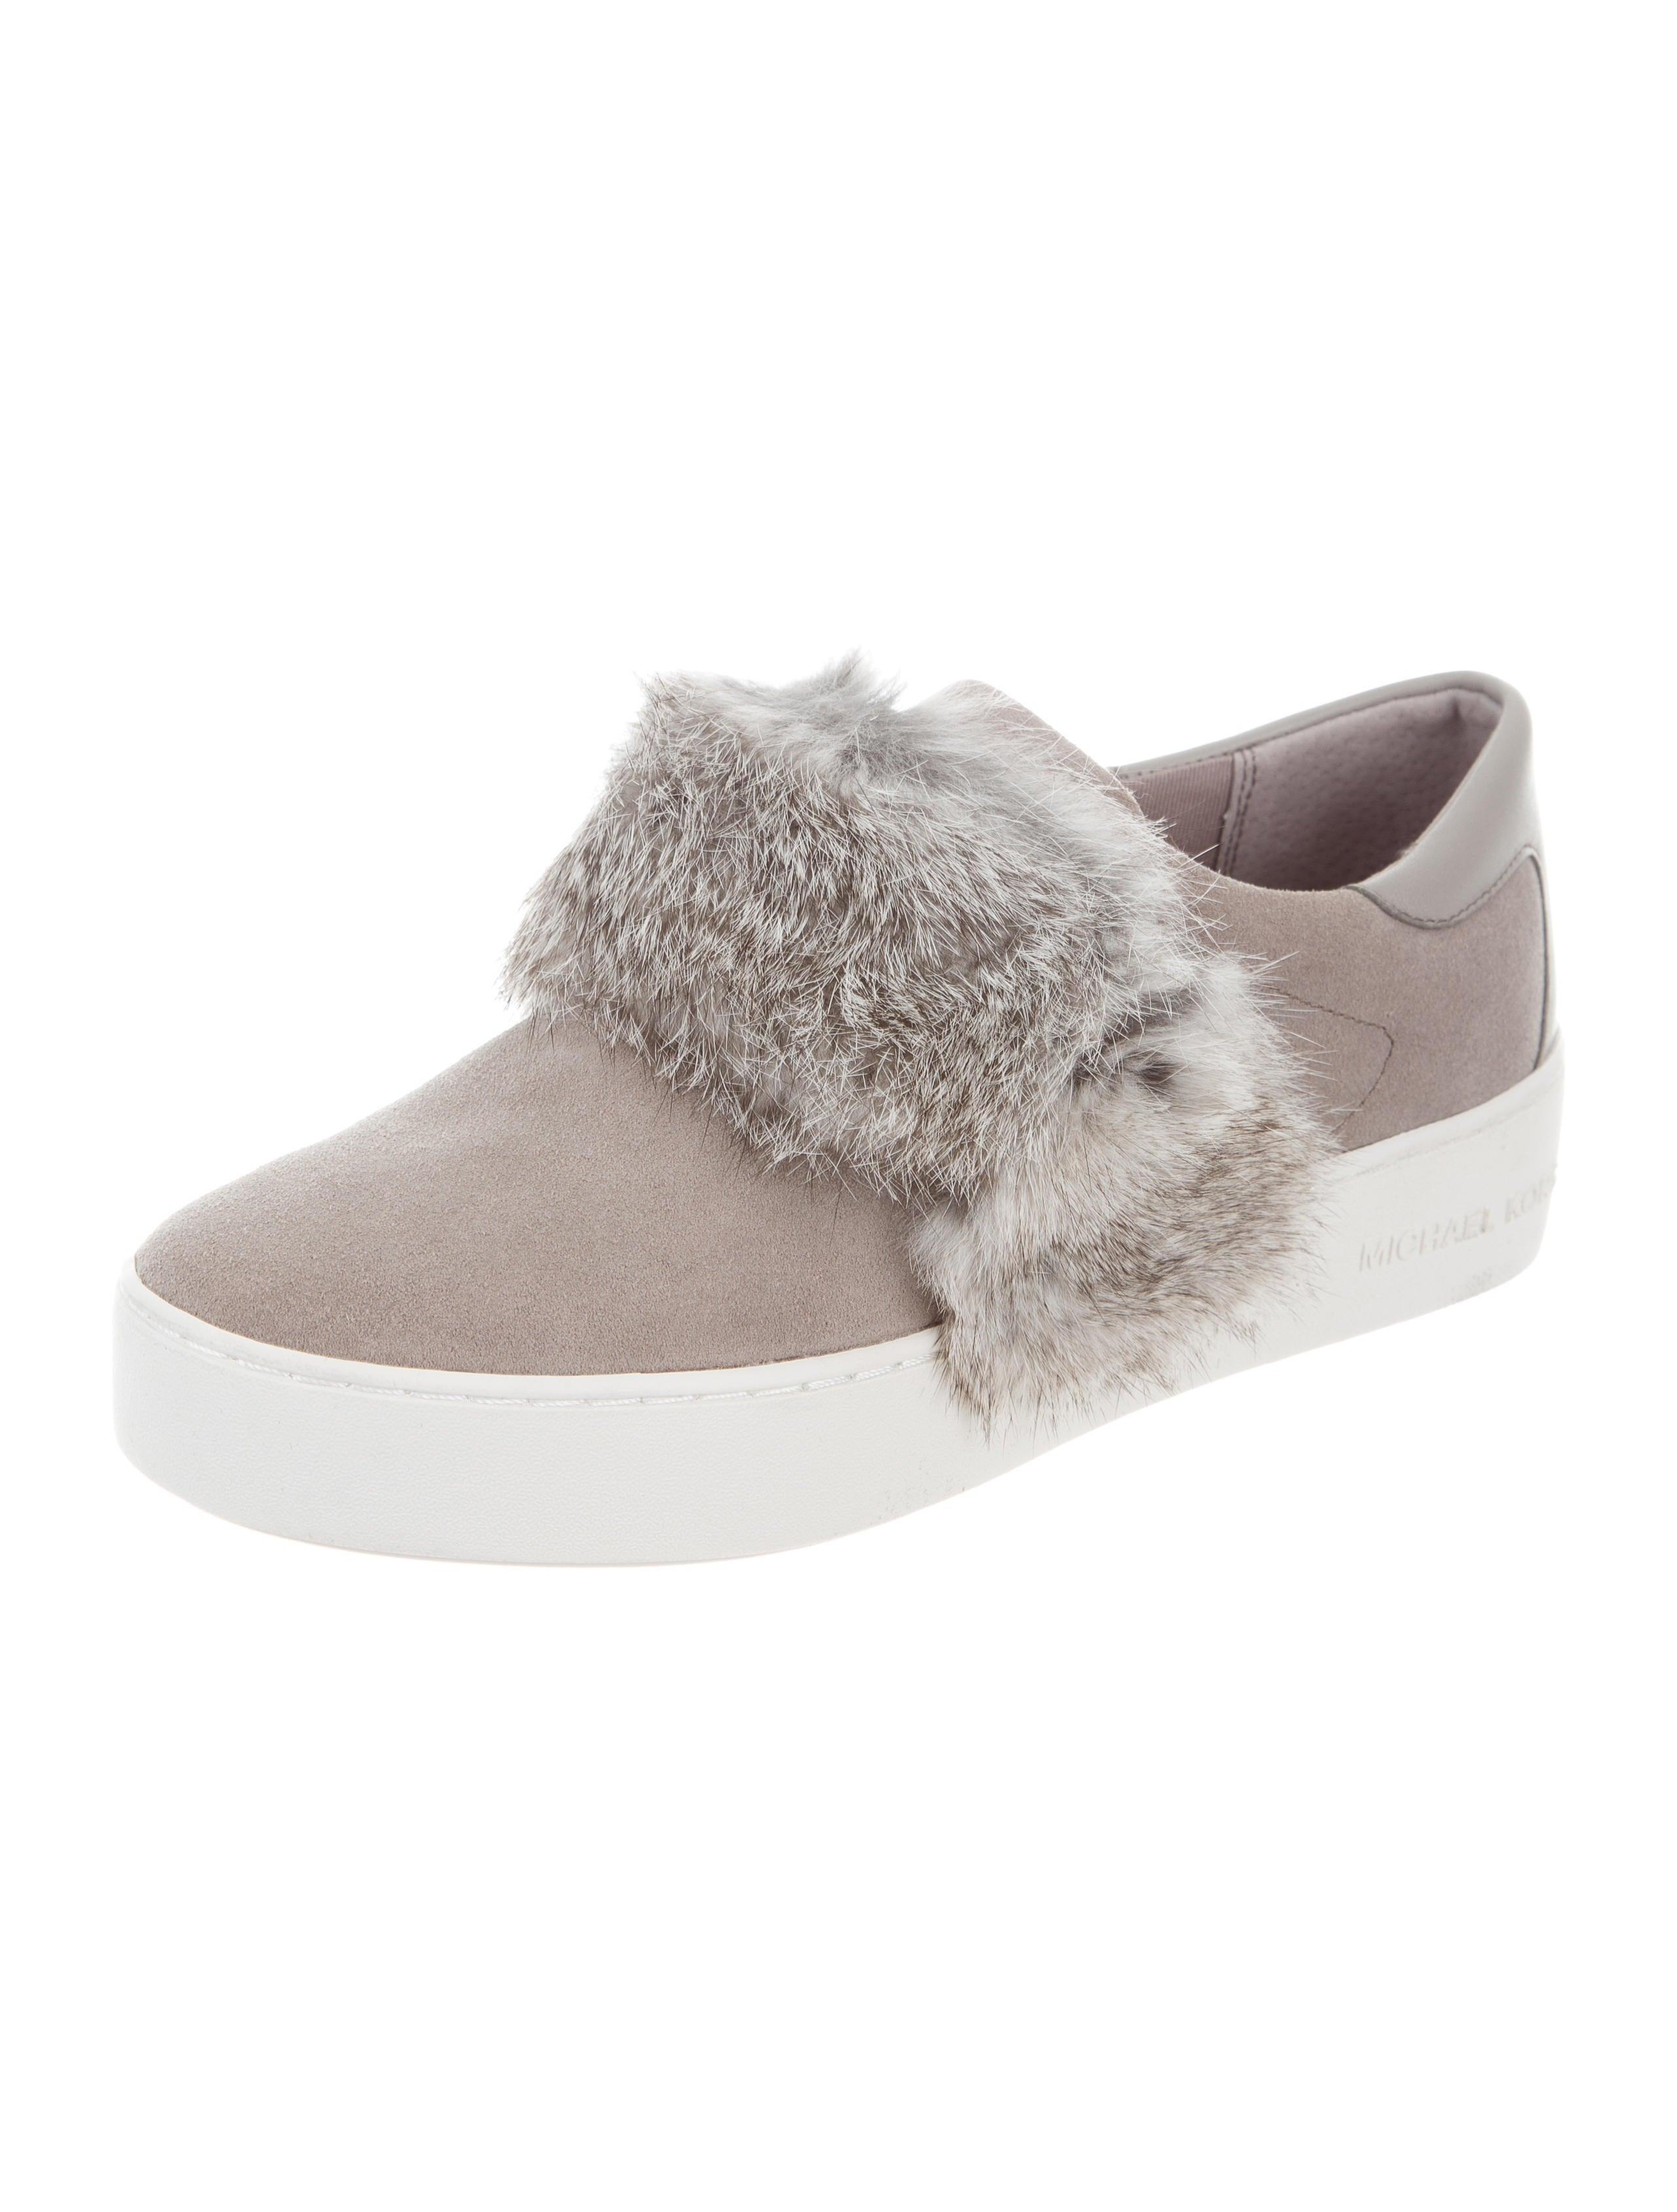 Michael Michael Kors Fur-Trimmed Slip-On Sneakers - Shoes ...